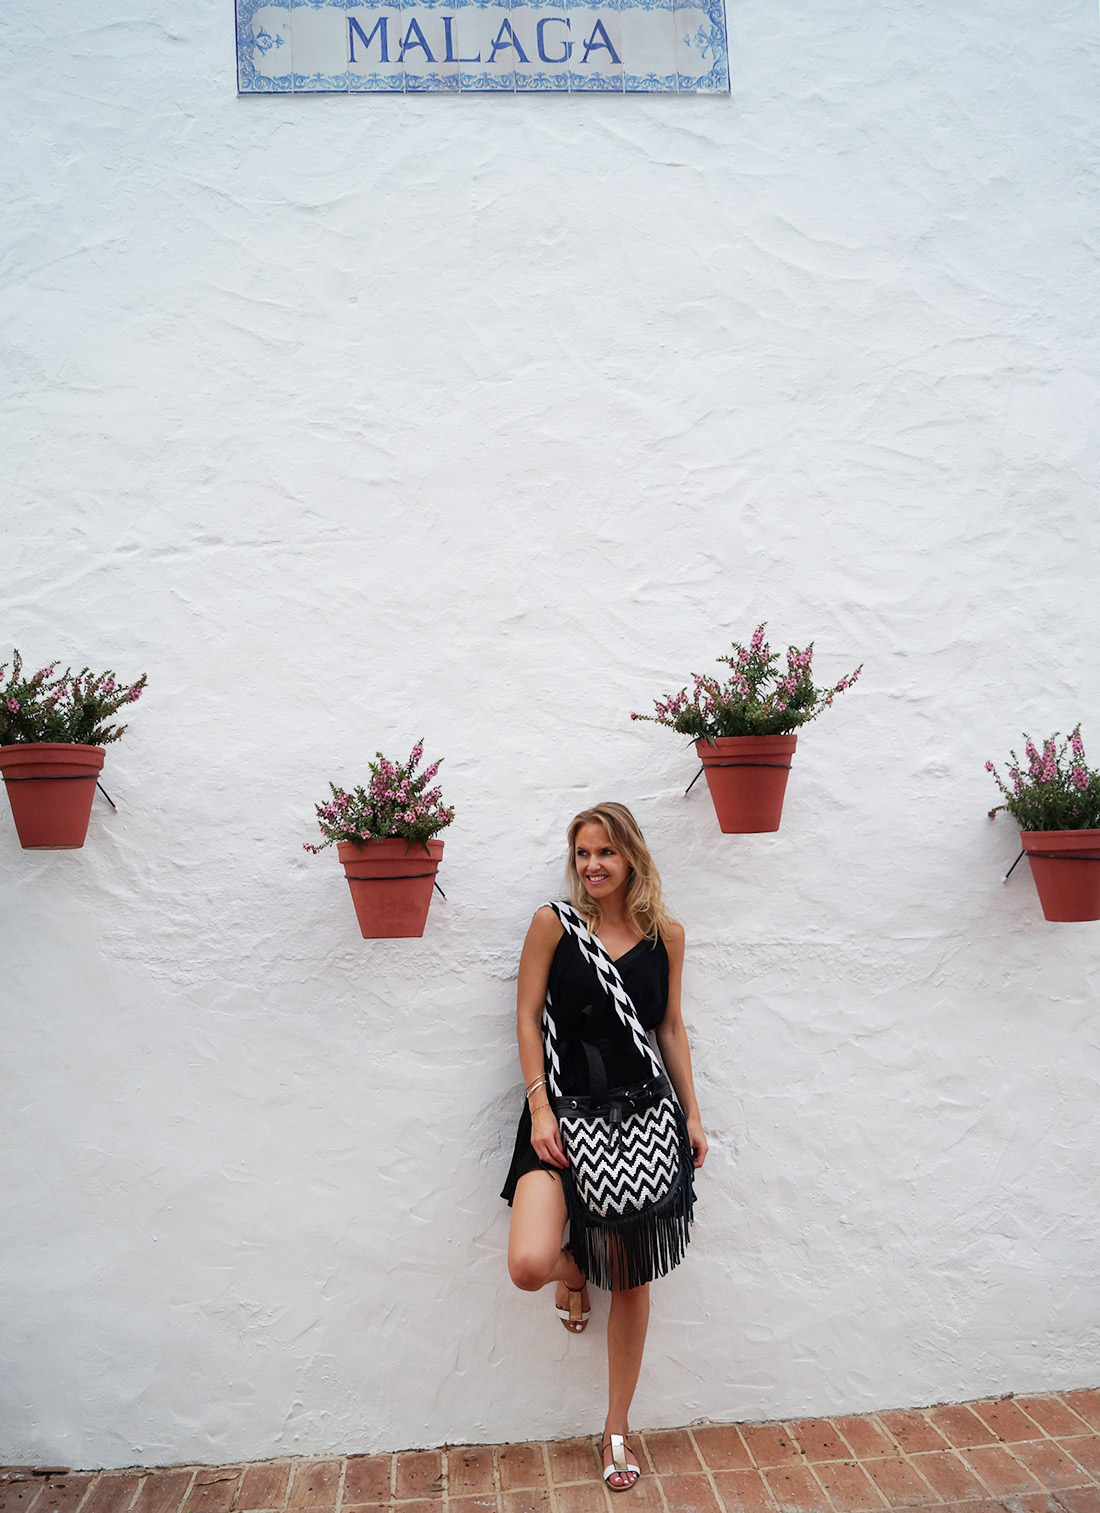 Bag-at-You---Fashion-blog---La-Bendicion-Bag---Wayuu-Colombia---Wearing-Little-Black-Dress---Malaga